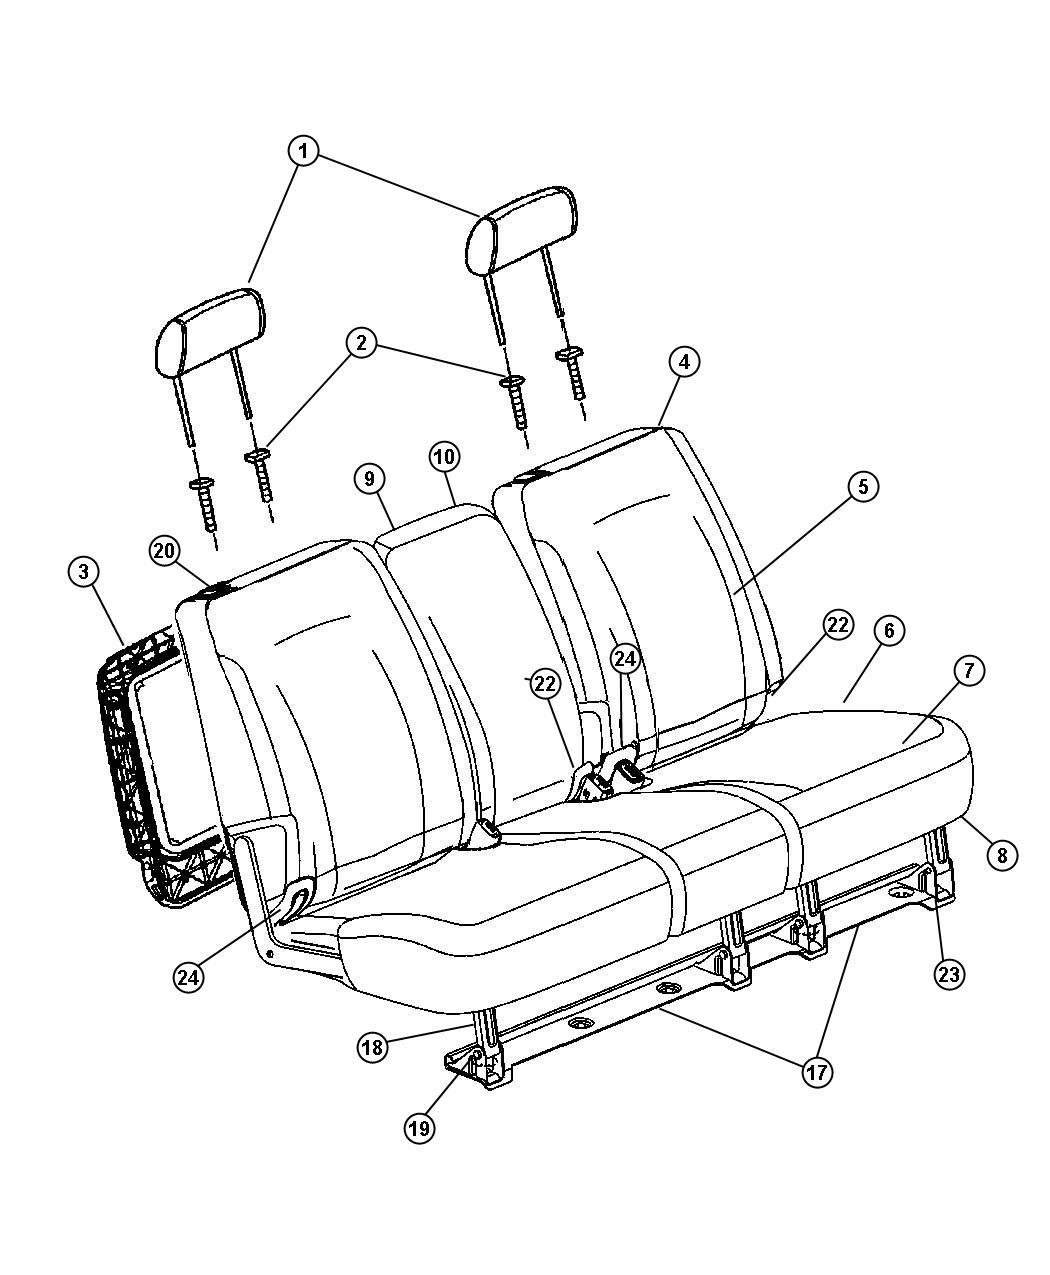 2007 Chrysler Pacifica Foam. Seat Back. 35%, 35% Side